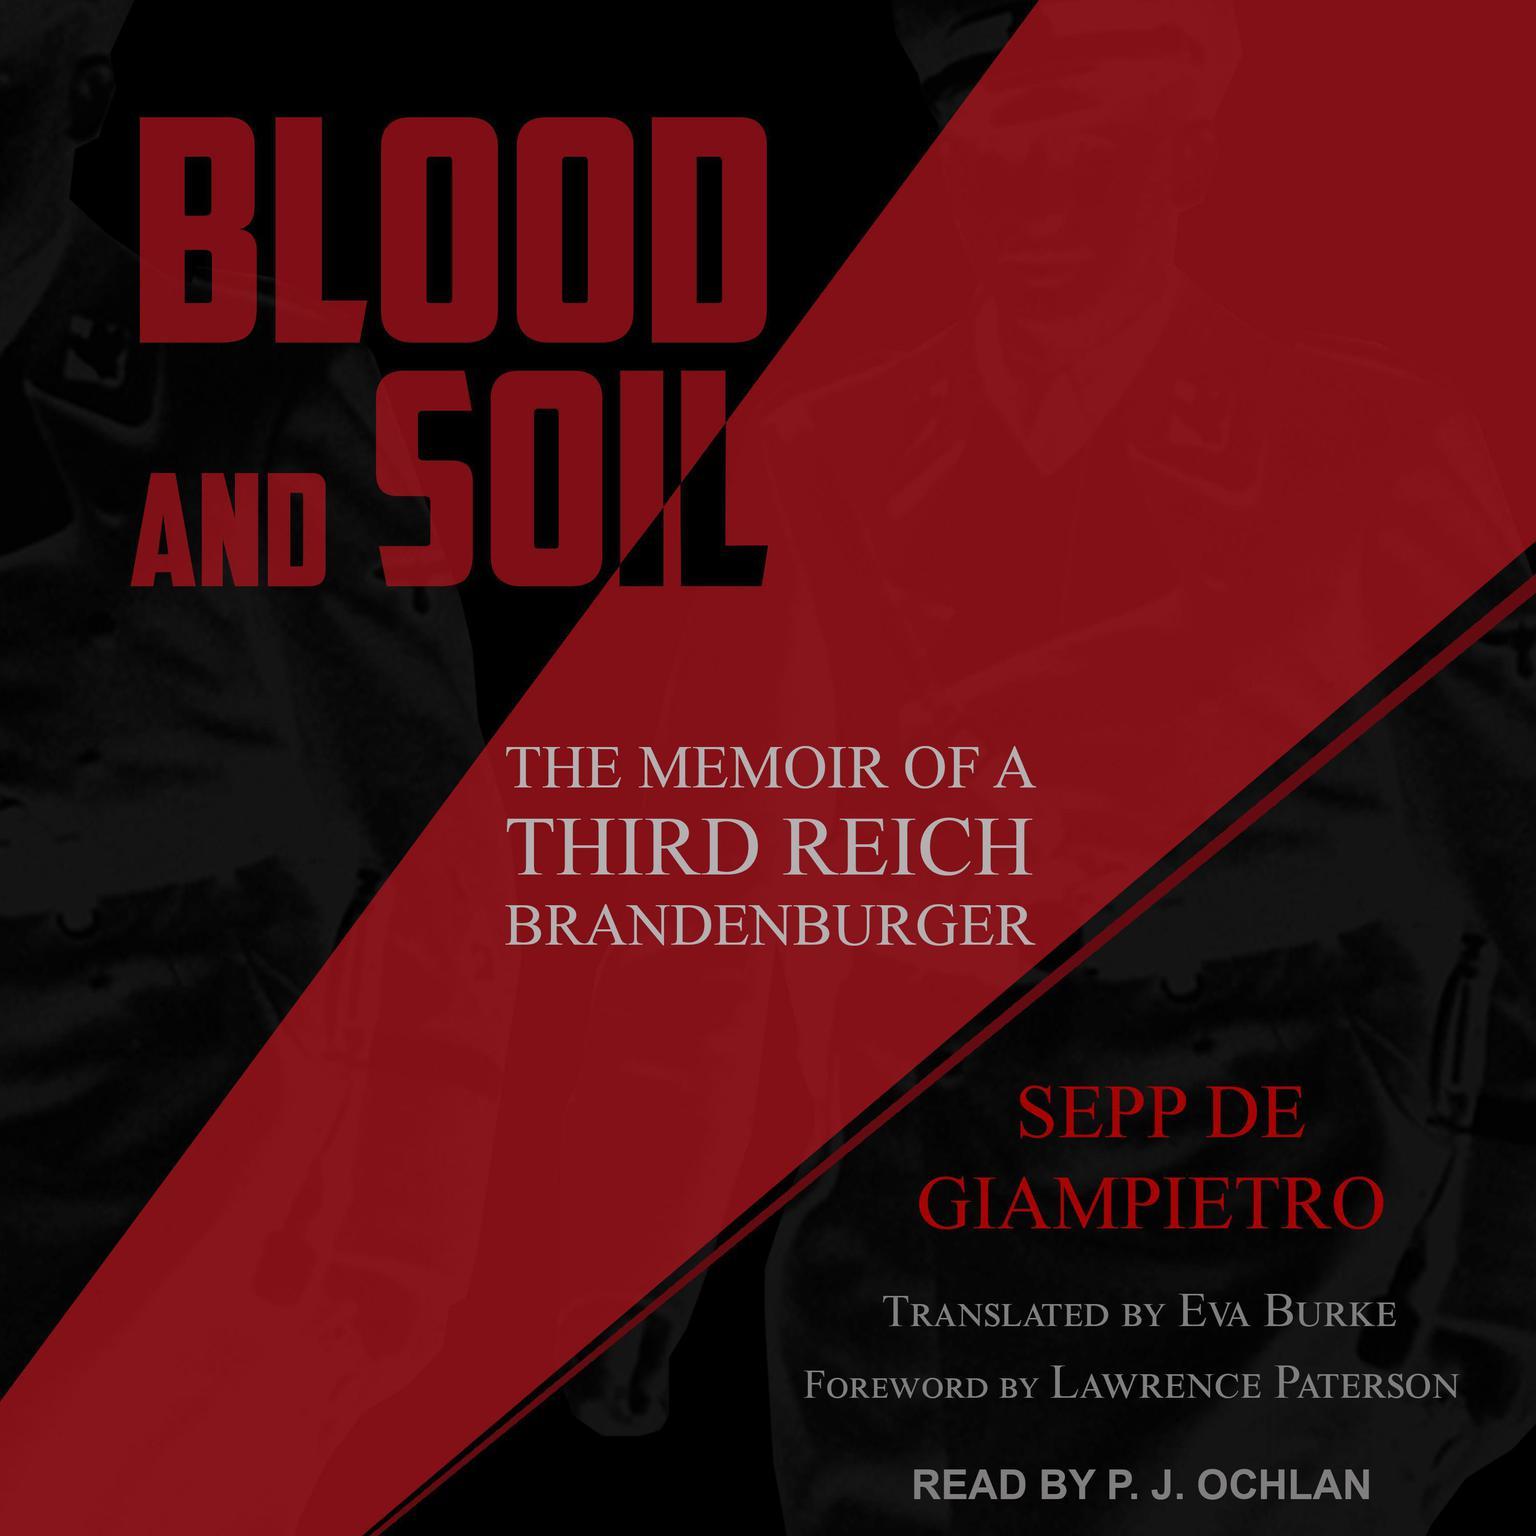 Blood and Soil: The Memoir of a Third Reich Brandenburger Audiobook, by Sepp de Giampietro